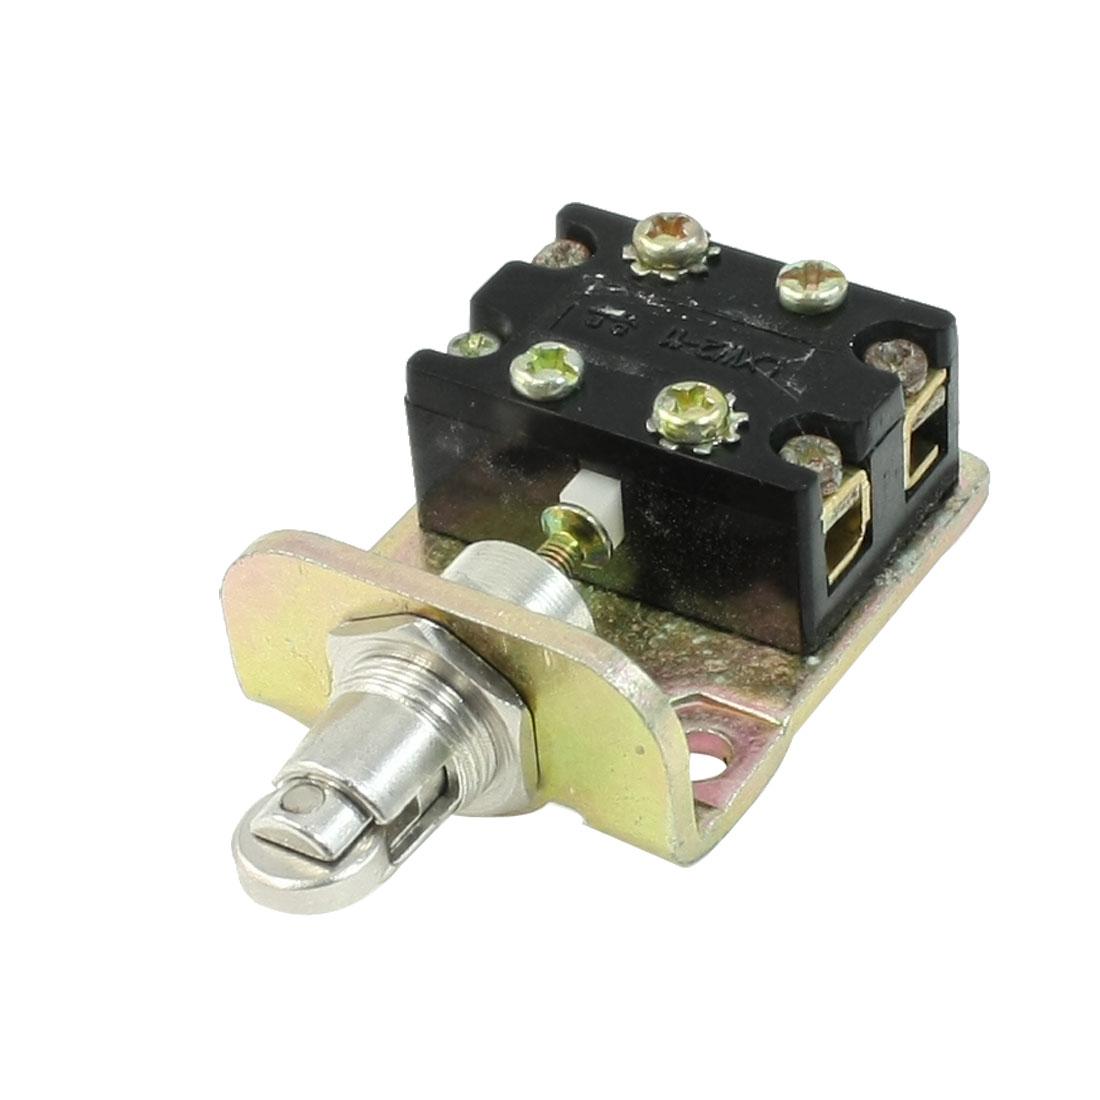 AC 380V 5A Parallel Roller Actuator 2NO+2NC DPDT 2P2T Limit Switch LXK2-411K